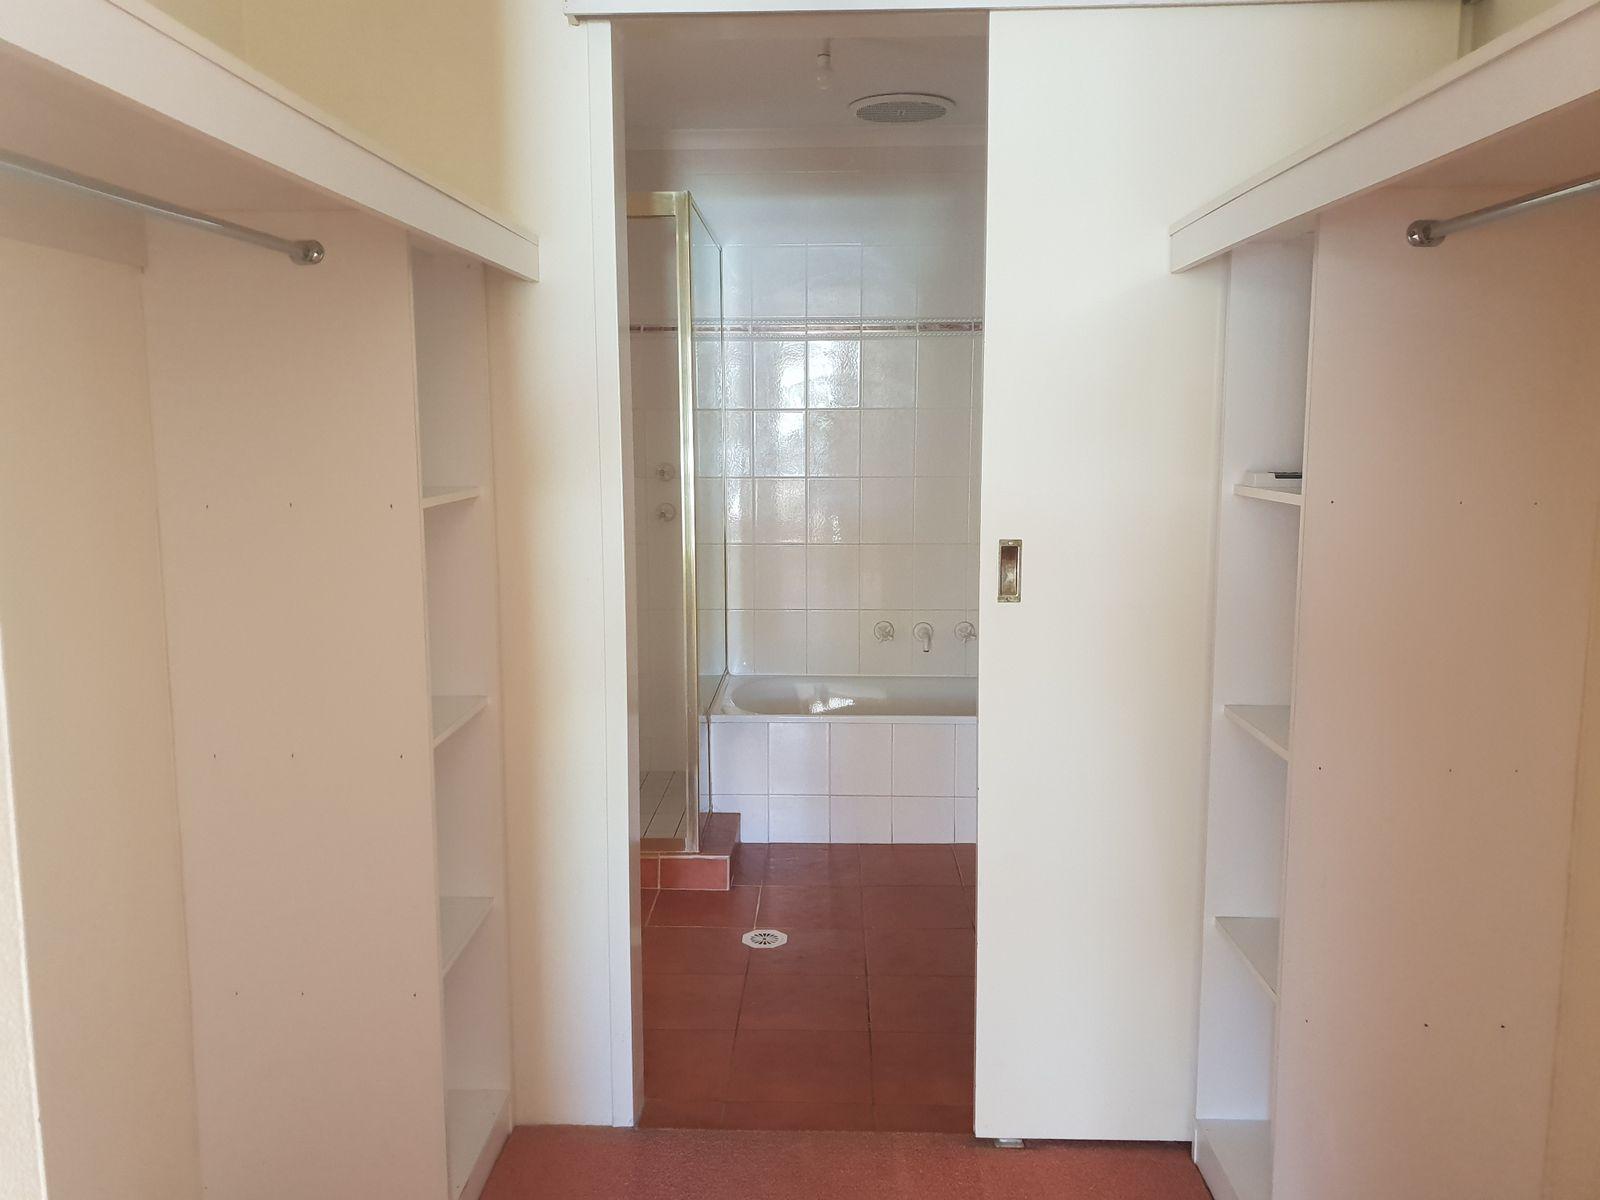 1/7 Fairview Court, Braitling, NT 0870